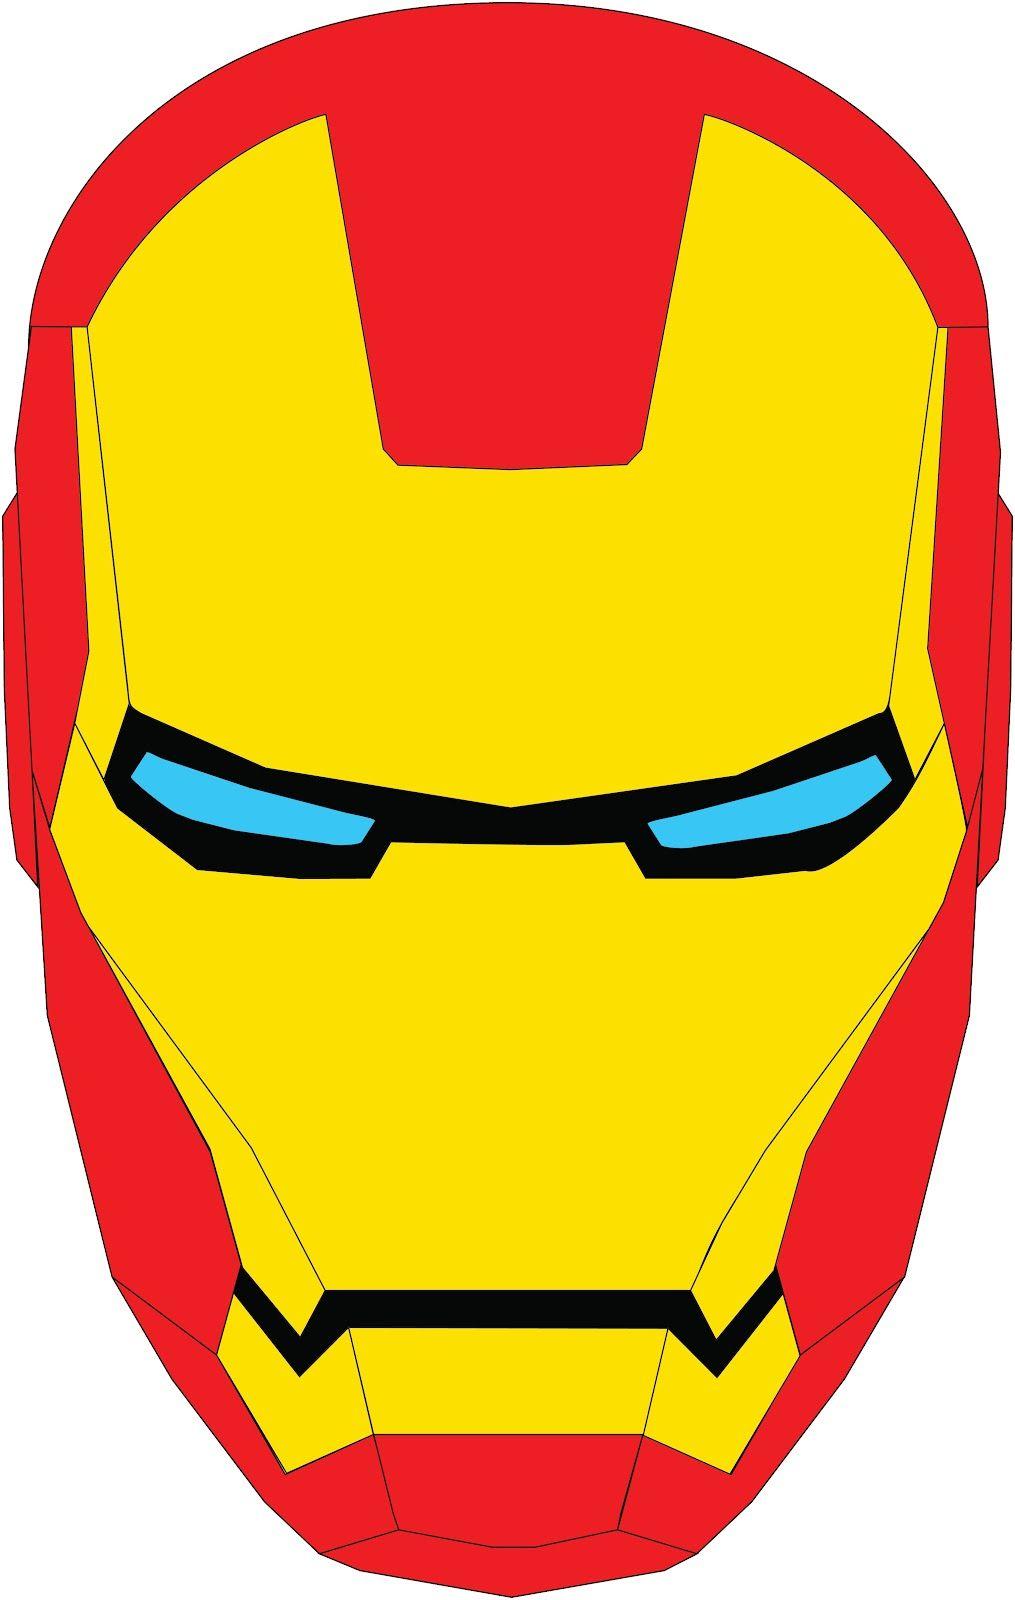 Iron Man1 Jpg 1015 1600 Iron Man Face Iron Man Symbol Iron Man Mask